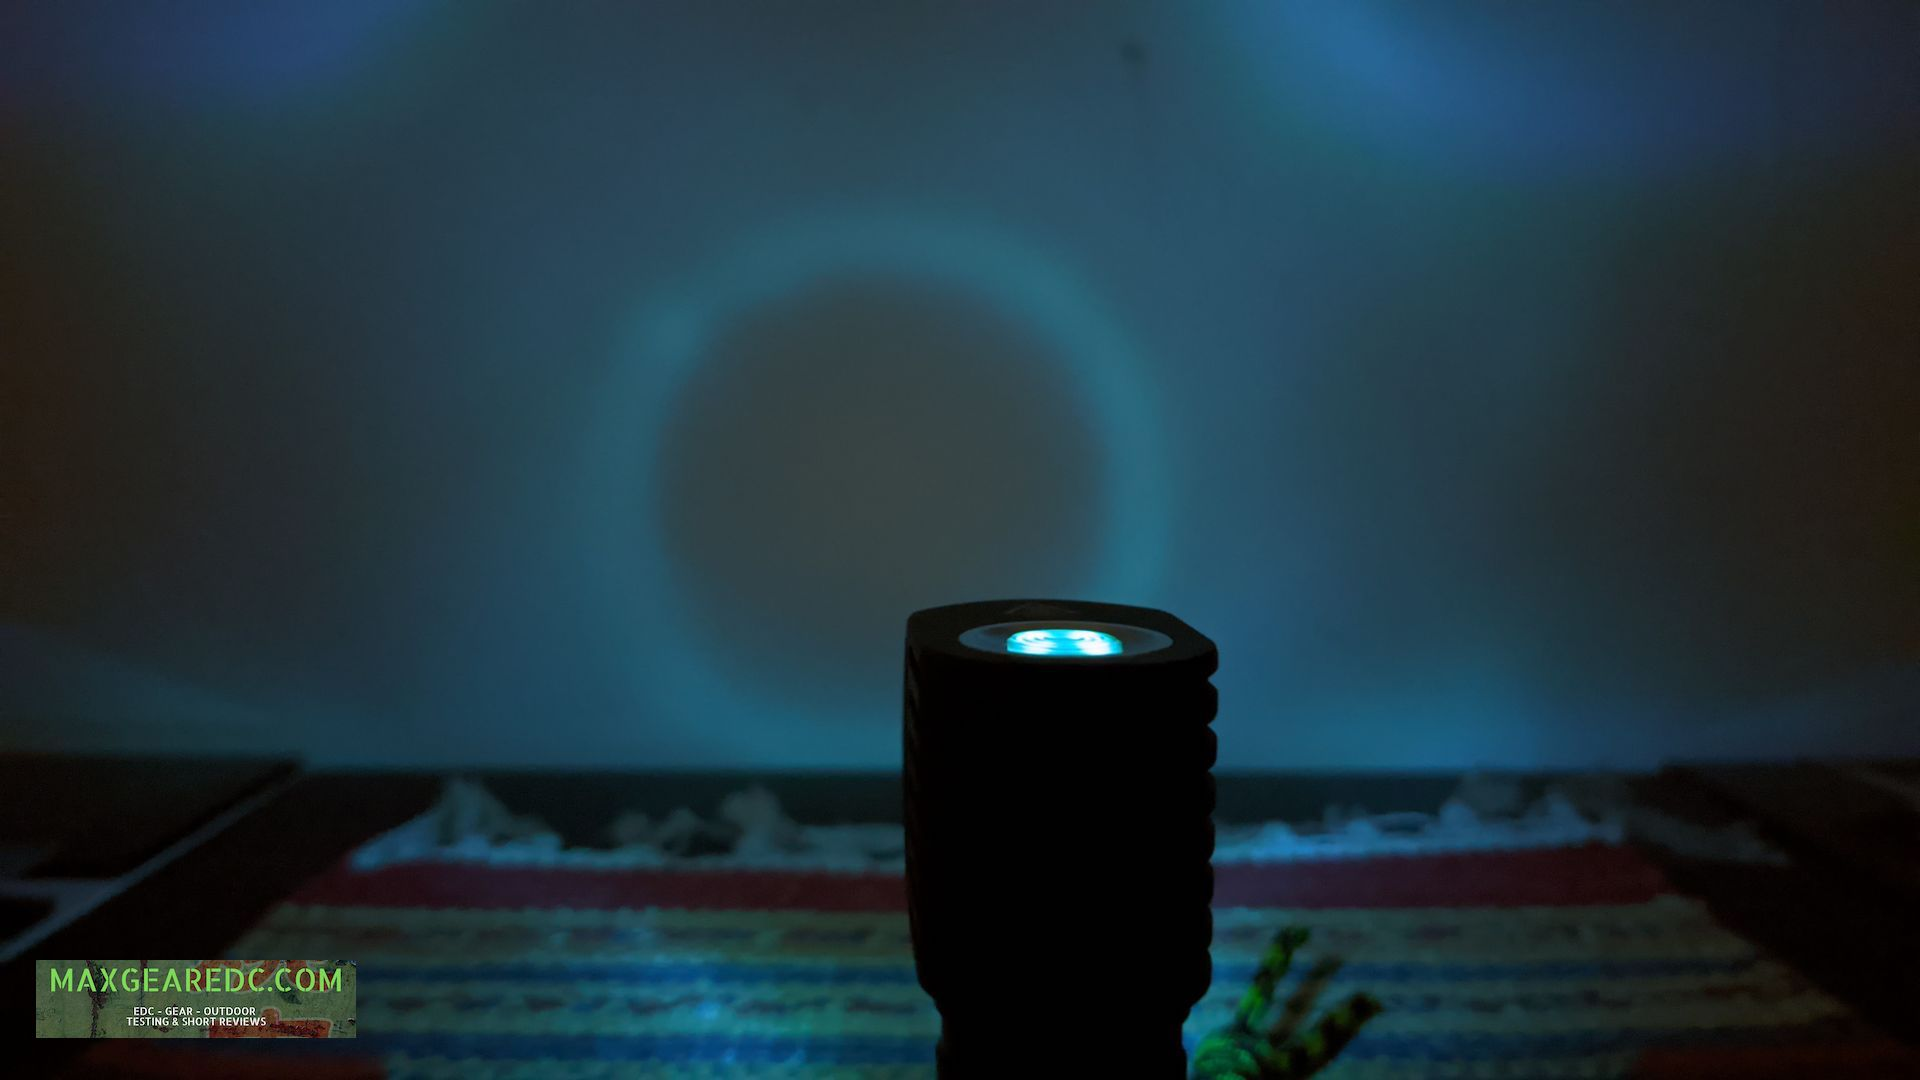 Fireflies_PL47G2_Flashlight_Review_Headlight_EDC_21700_maxgearedc.com_EDC_GEAR_OUTDOOR_TESTING_and_SHORT_REVIEWS_21